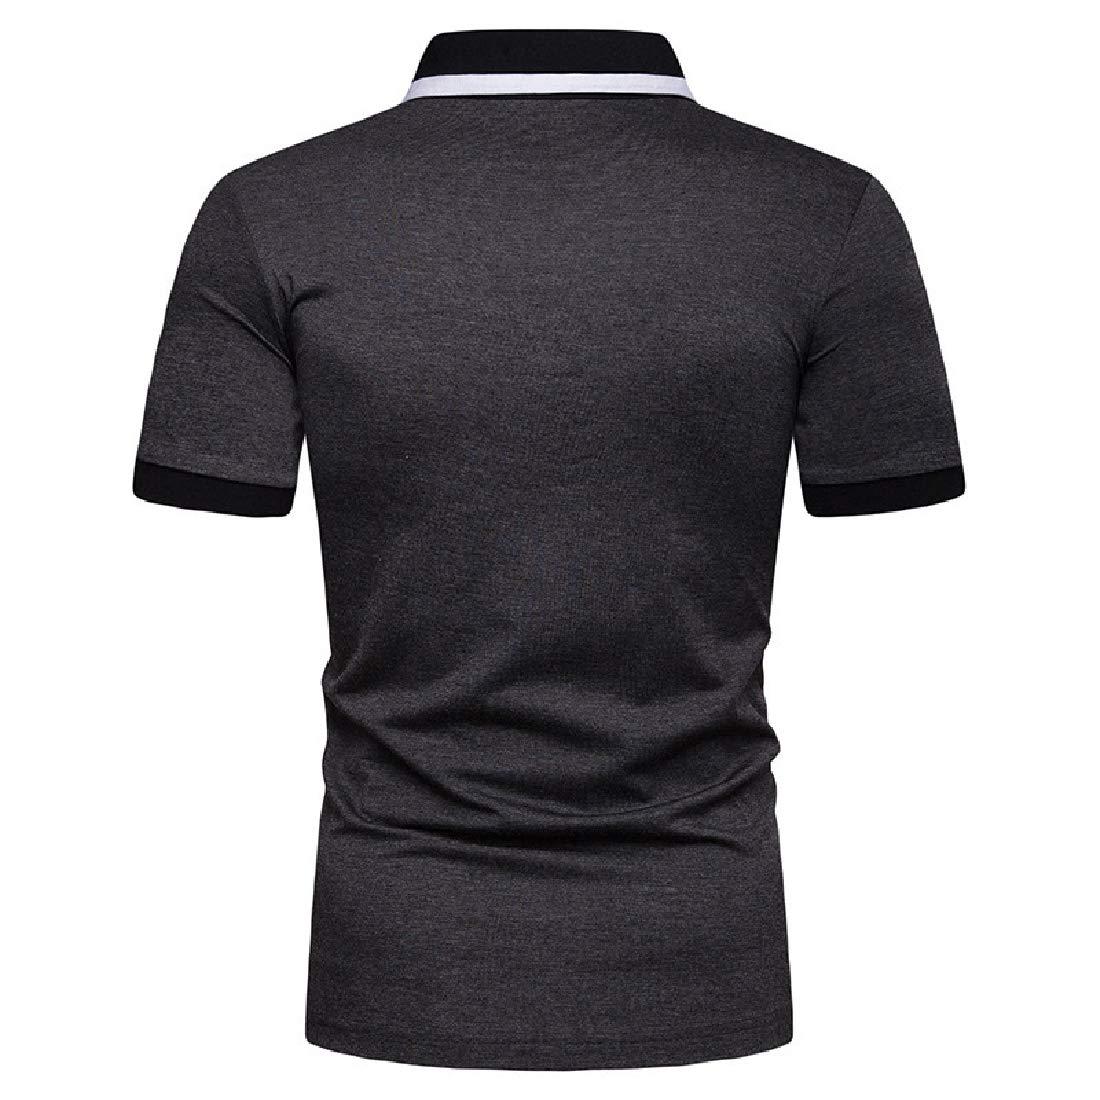 Winwinus Mens Short-Sleeve Contrast Fashion Cotton Casual Pique Polo Shirt